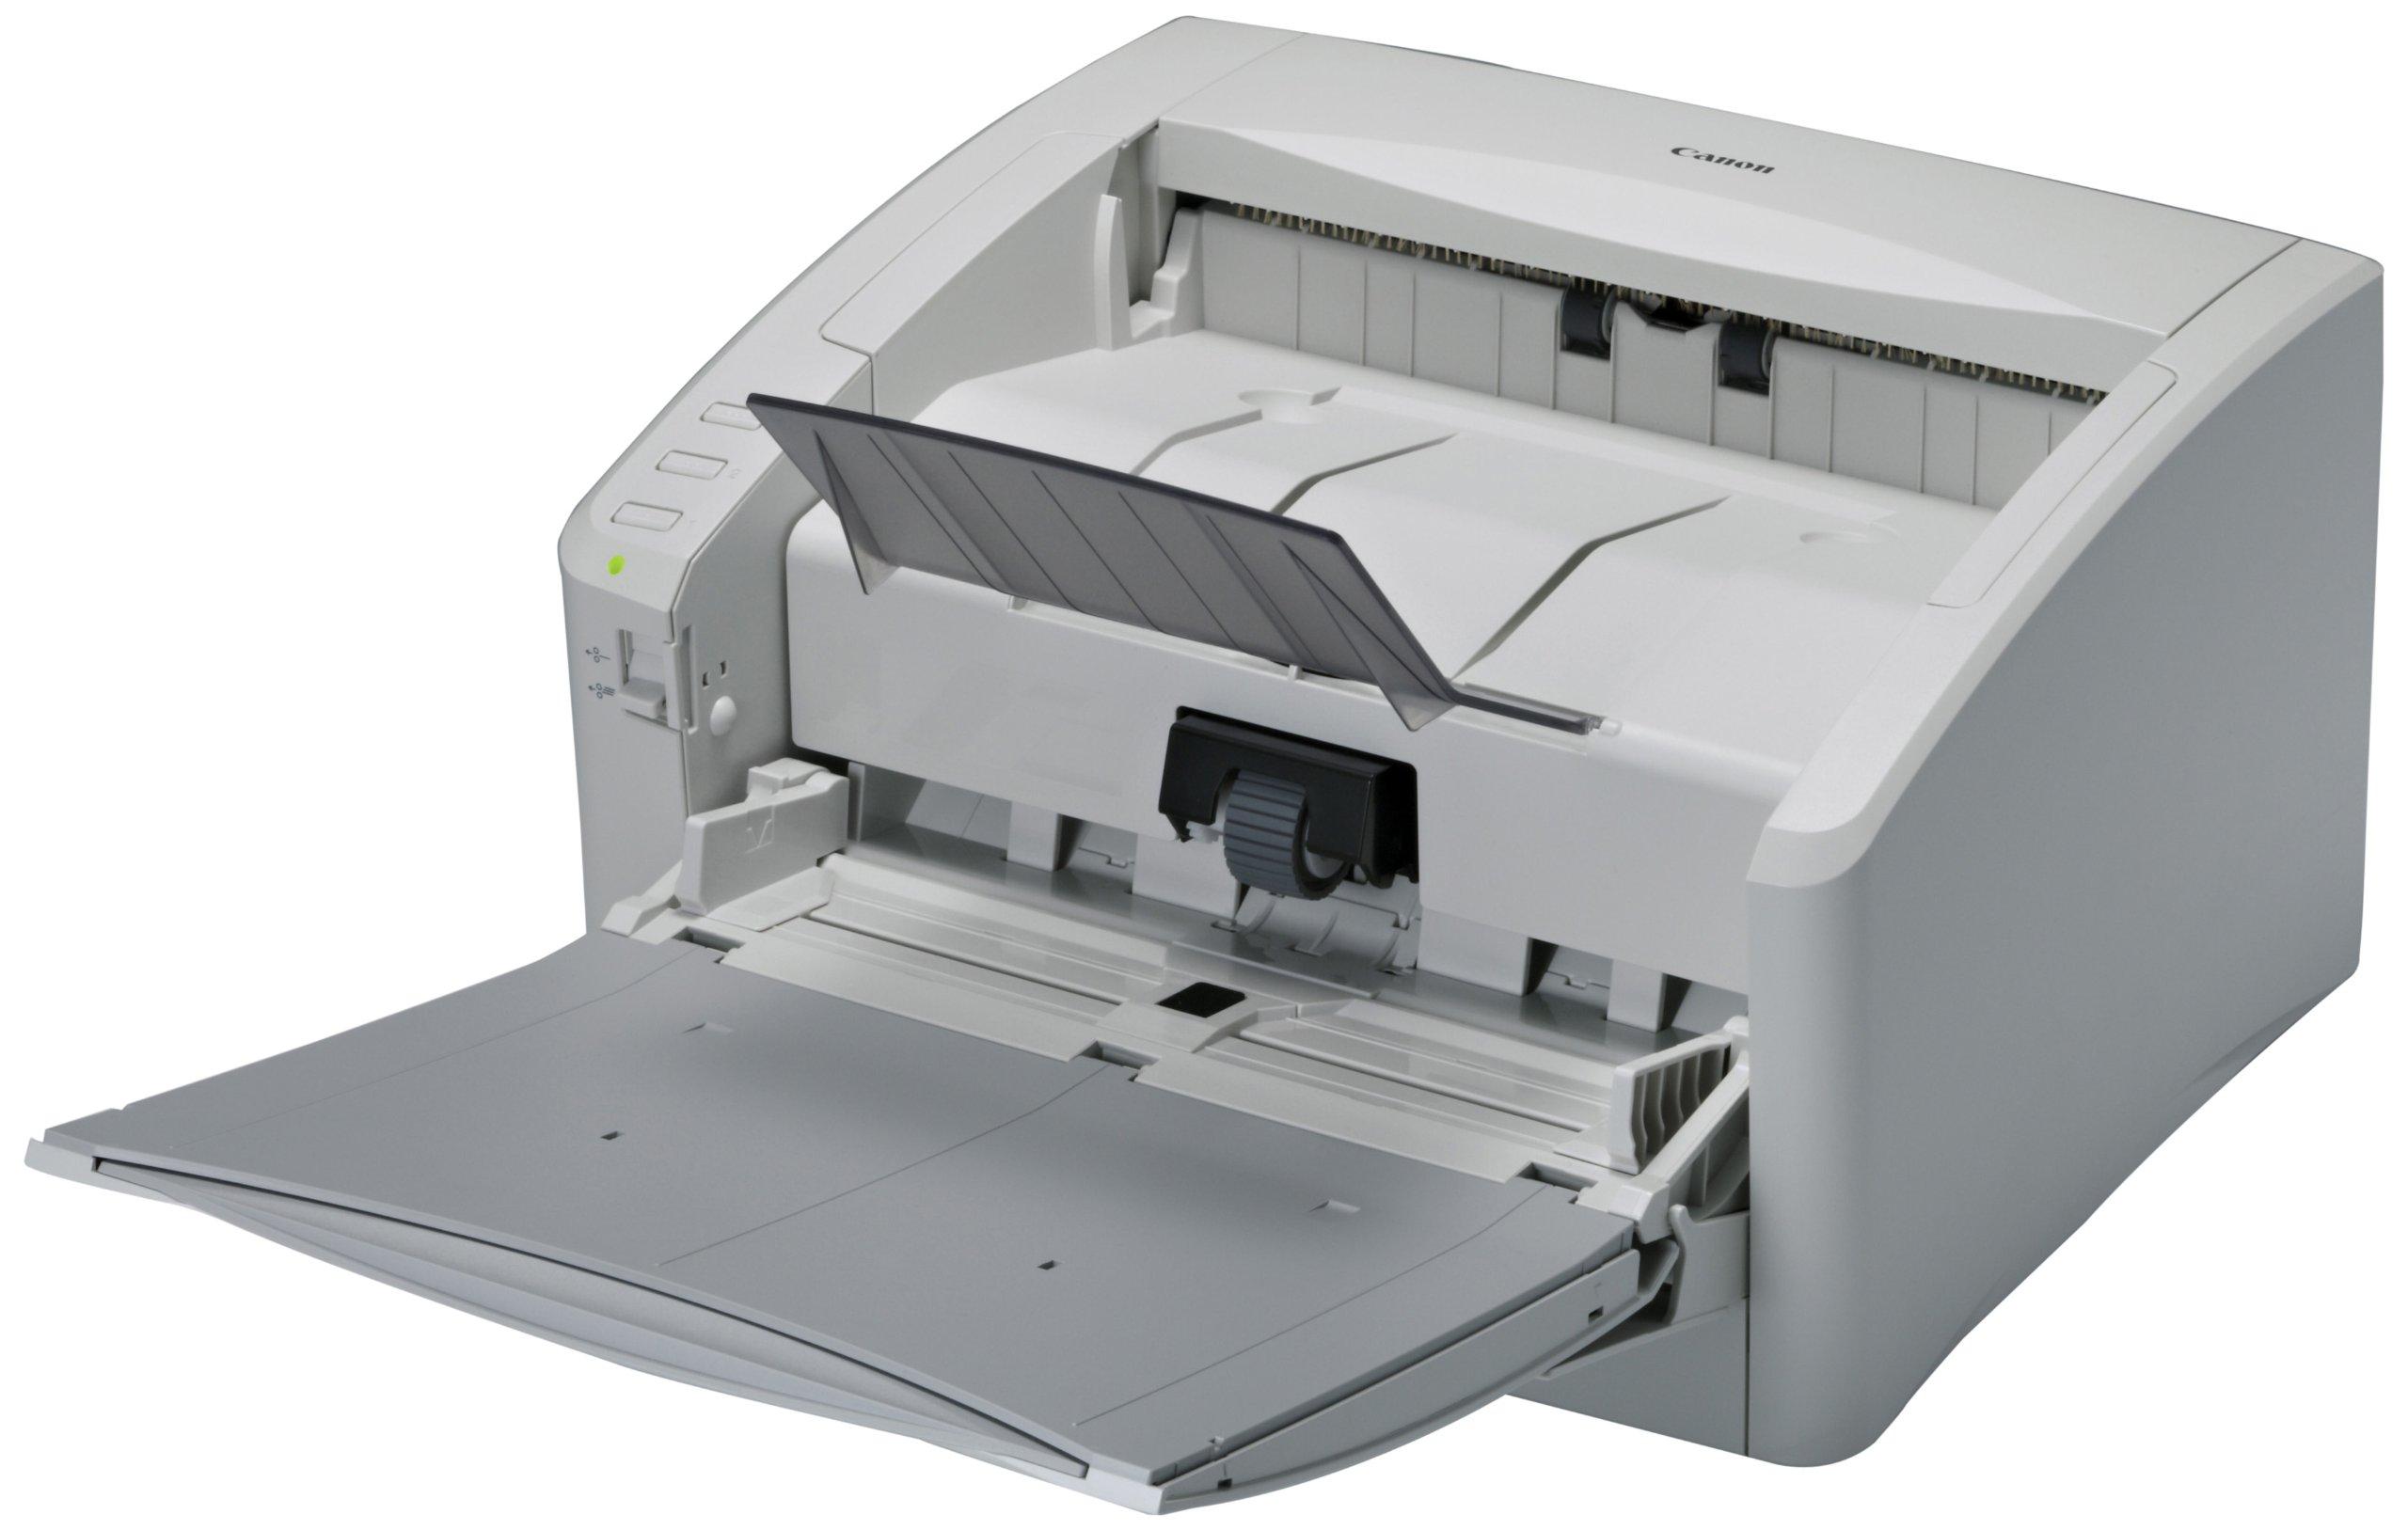 Canon imageFORMULA DR-6010C Office Document Scanner